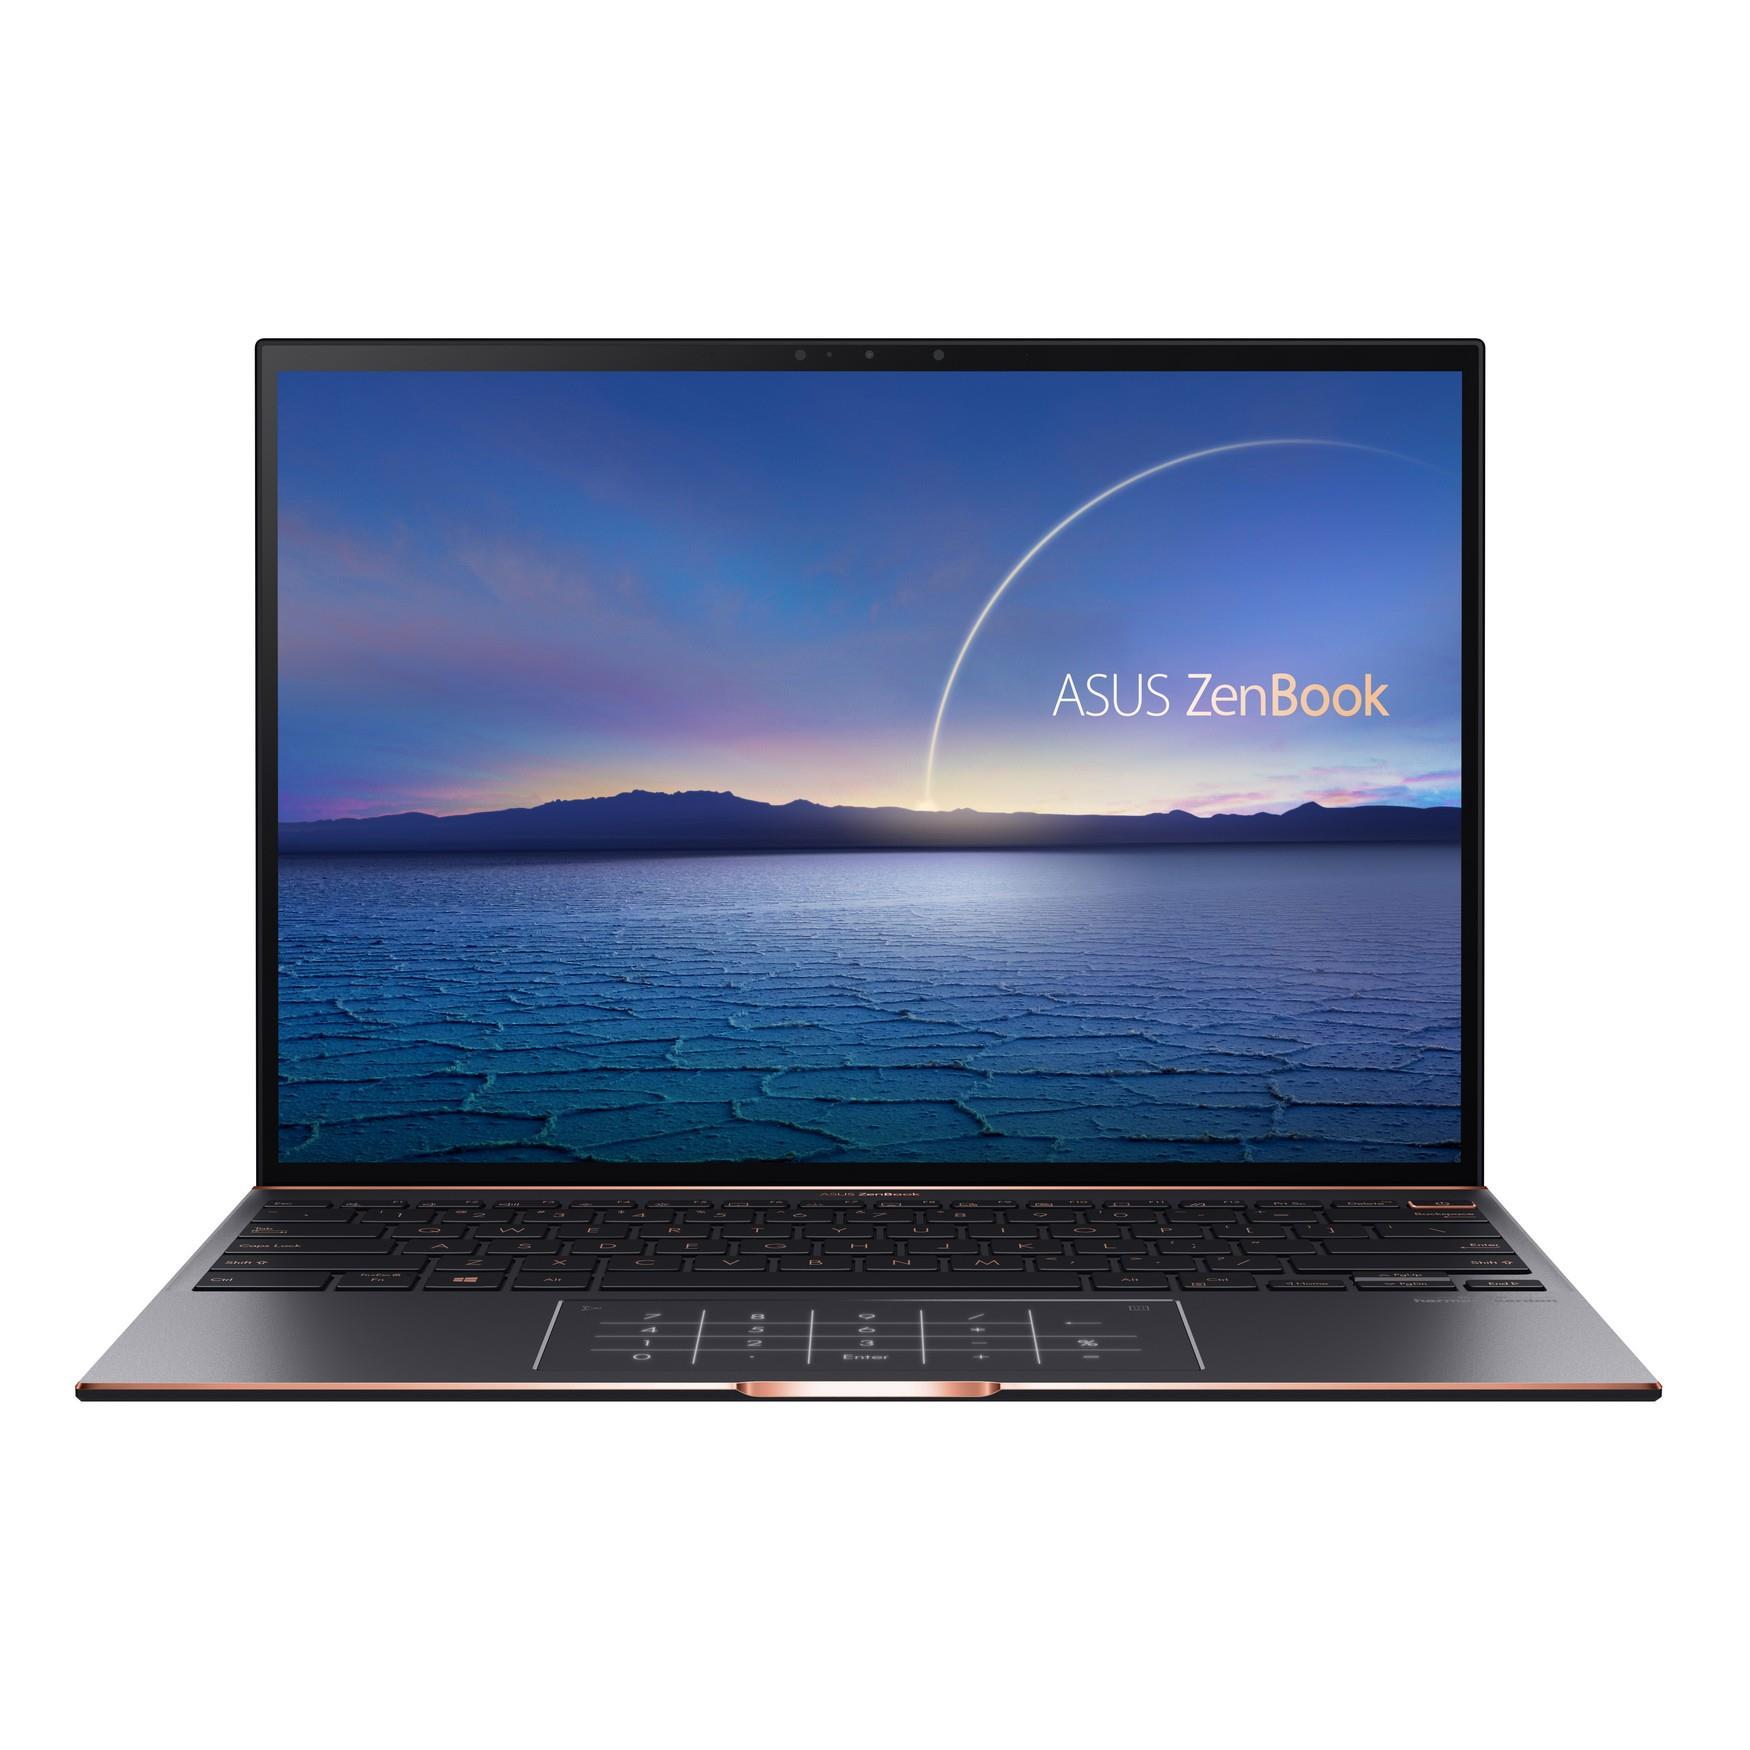 ASUS Zenbook S - 13,9''/Touch/i7-1165G7/16GB/512GB SSD/W10H (J.Black/Alumi.)+ Záruka 3Y PICKUP&RETURN - UX393EA-HK004T